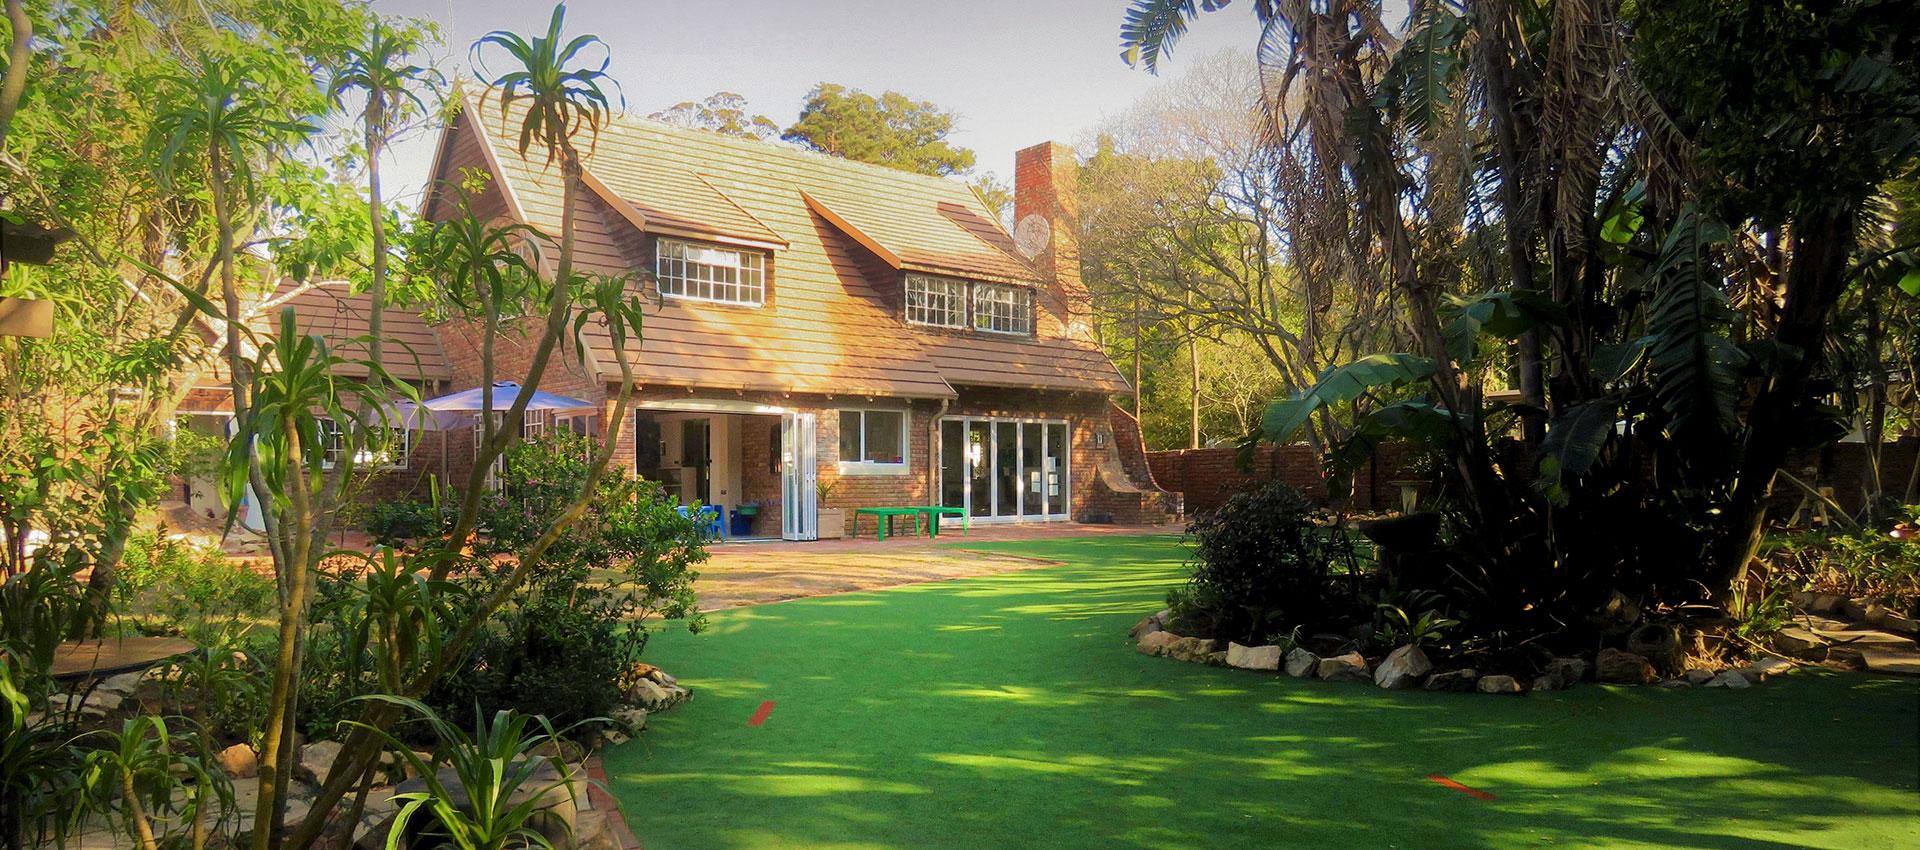 House-from-back-garden